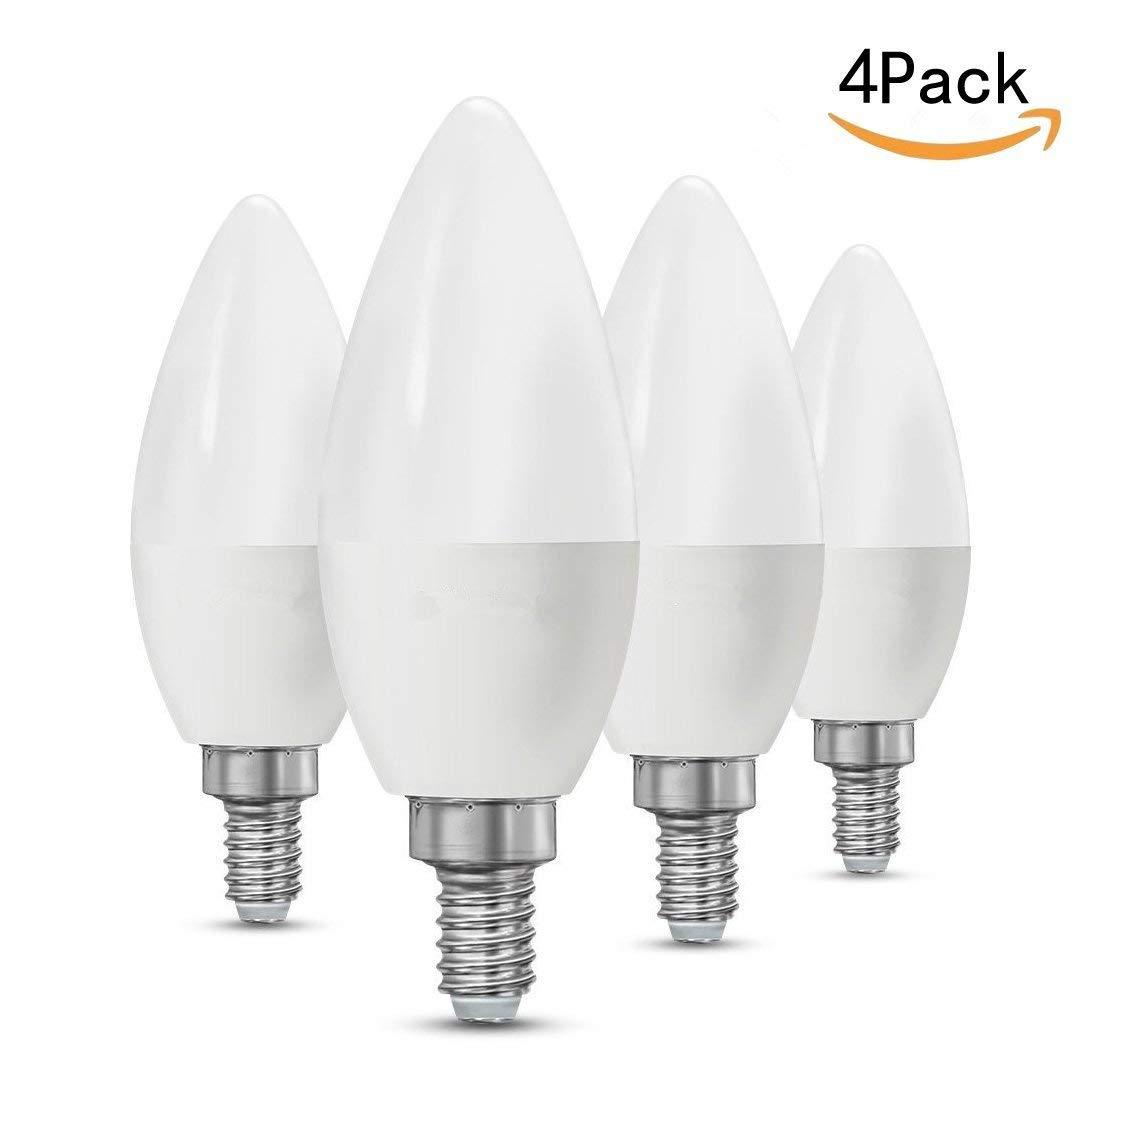 CTKcom 5W LED Candelabra Bulbs(4 Pack)- E14 Base Equivalent Warm White Light 3000K 430LM Candle Light Bulbs for Chandelier, Ceiling Fan Lights, Decorative Candle Light Bulb, AC85-265V